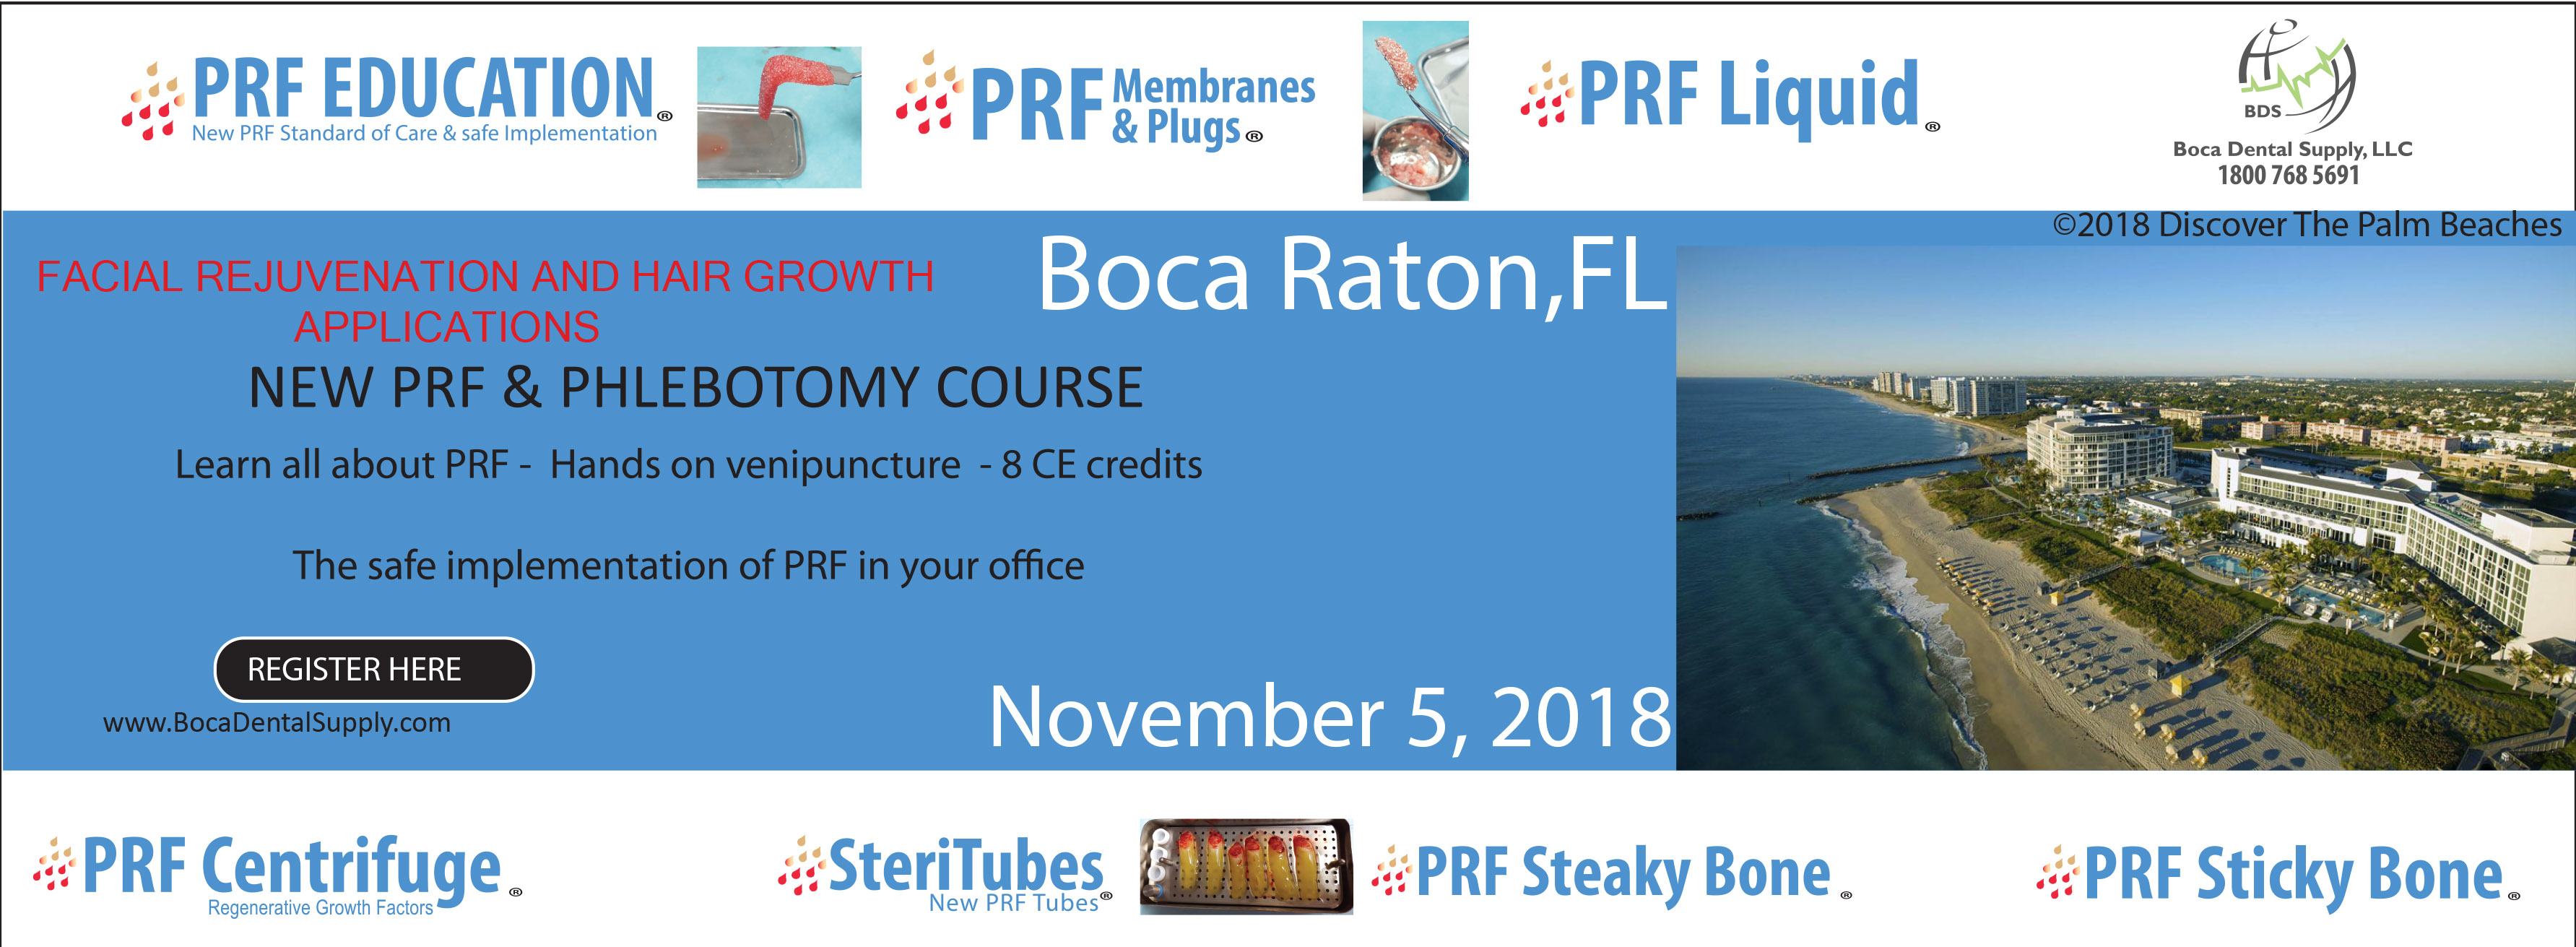 prf-course-boca-raton-facial-rejuvenation-2018.jpg